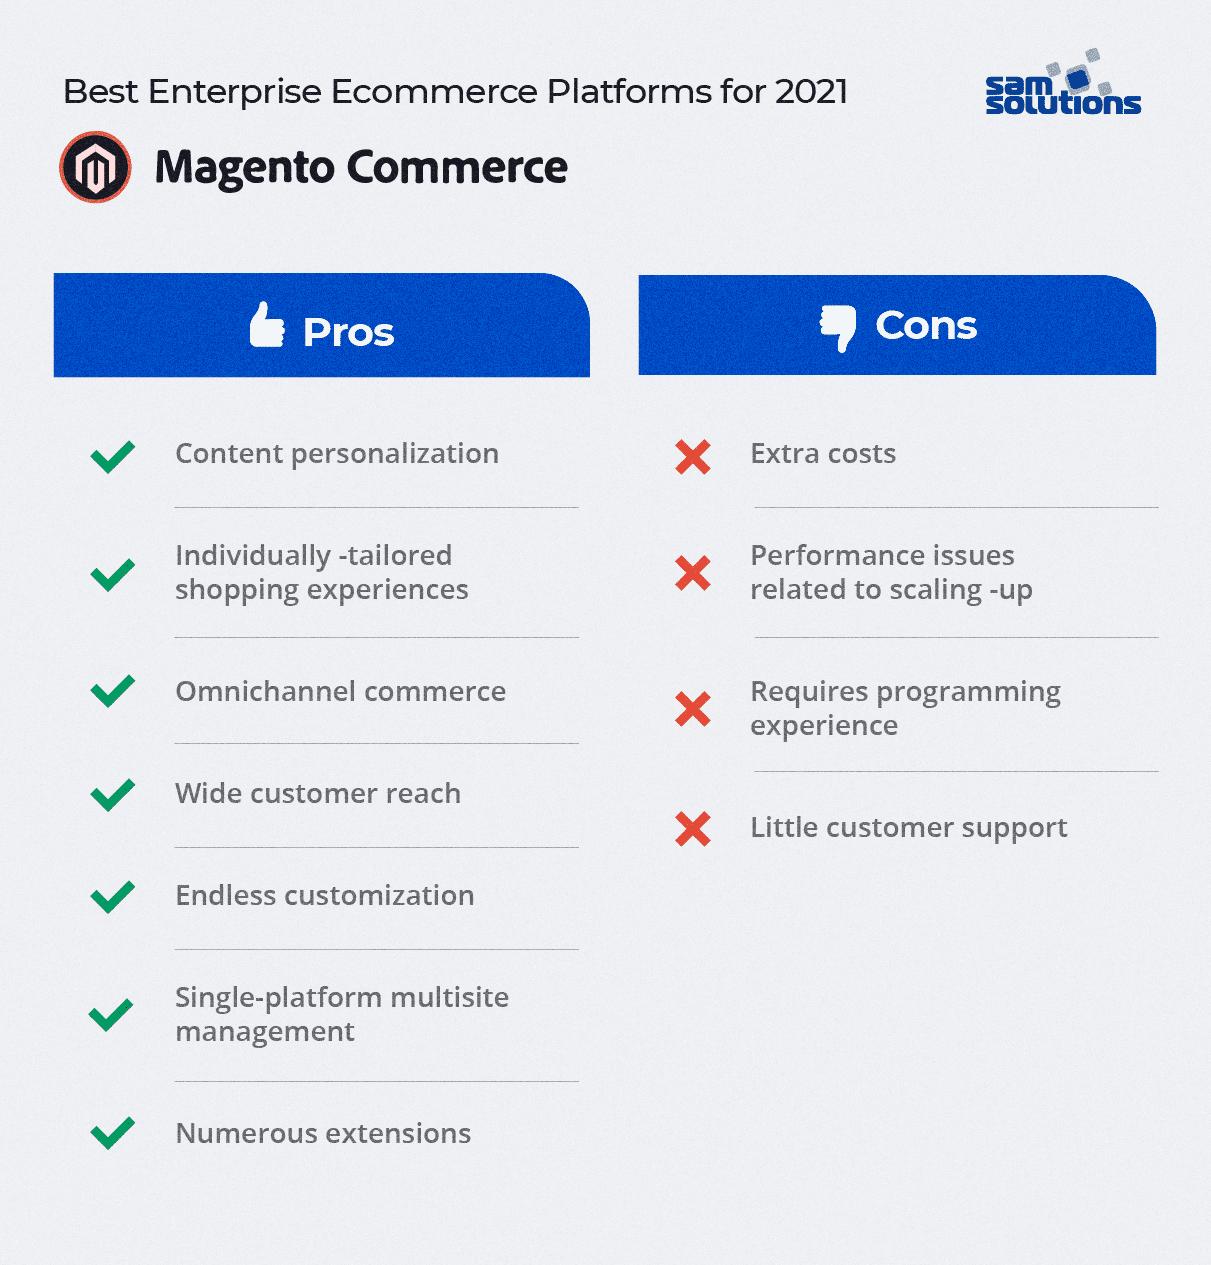 Magento-Enterprise-Ecommerce-Platform-pros-cons-photo